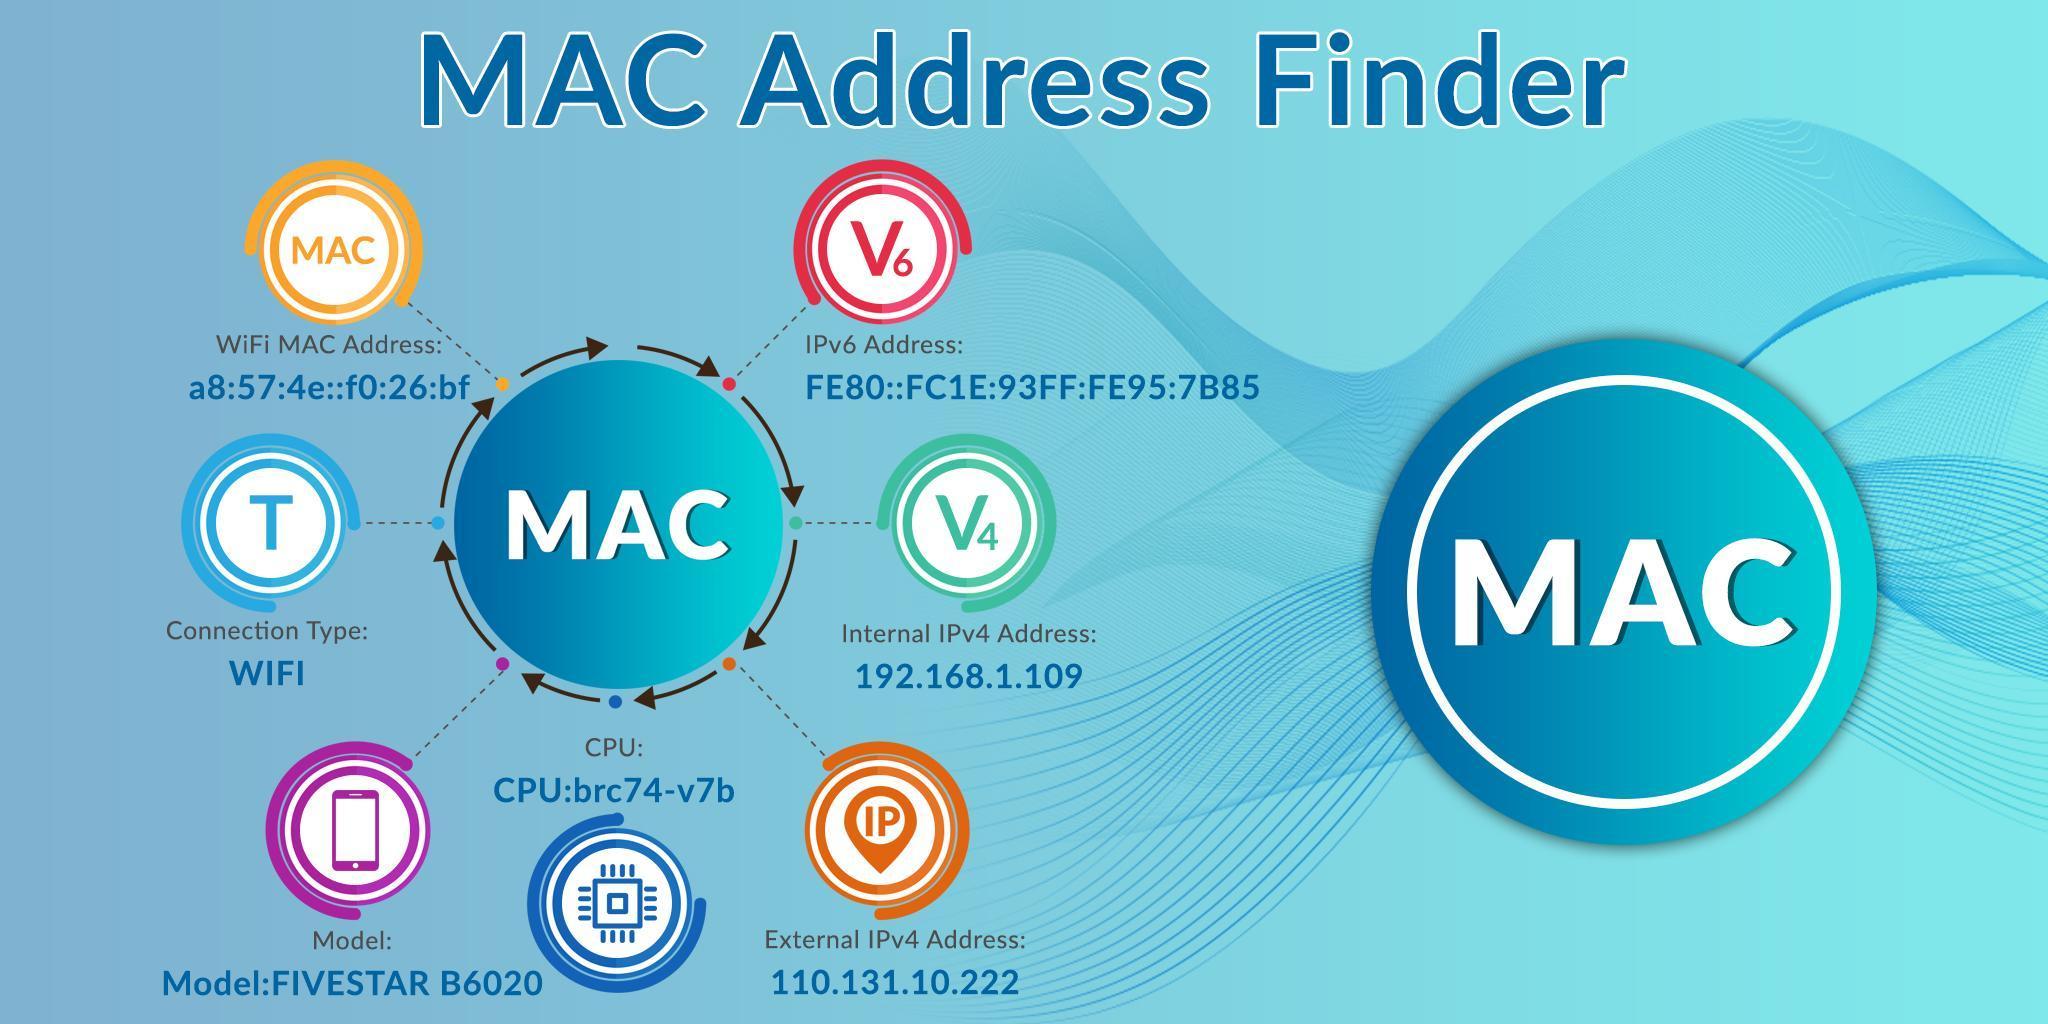 Vlc Player Mac Address